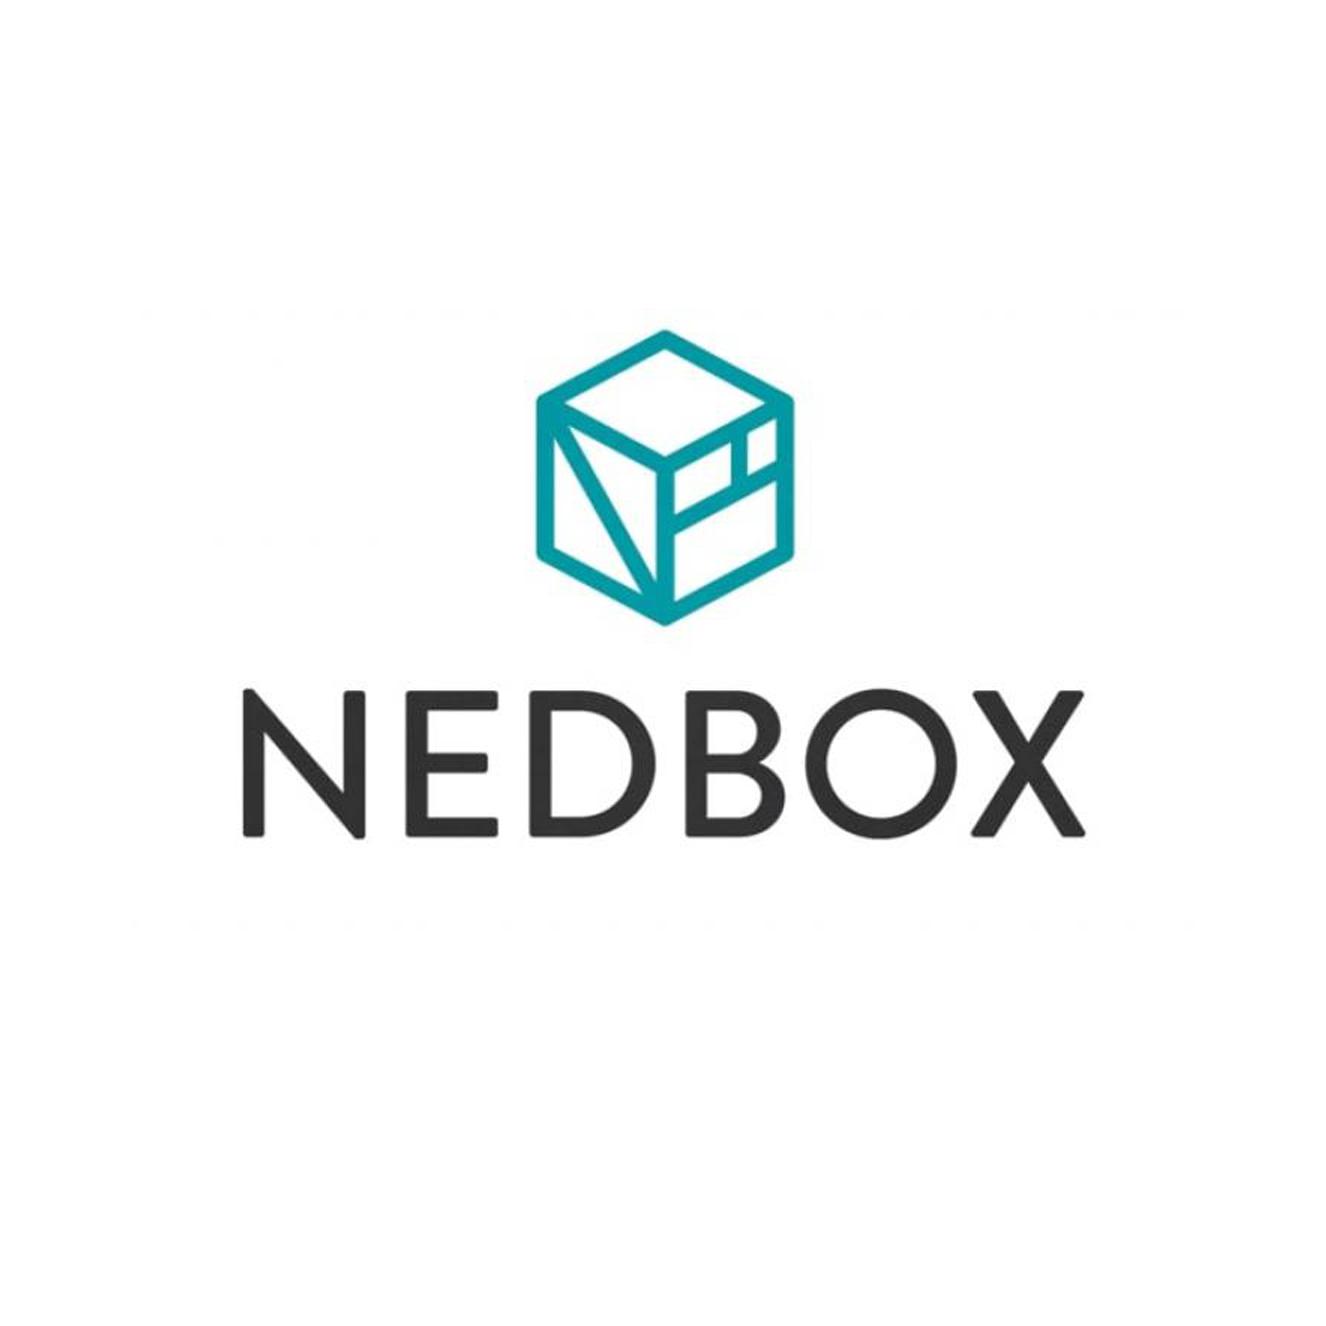 Nedbox kiest voor assessmentQ